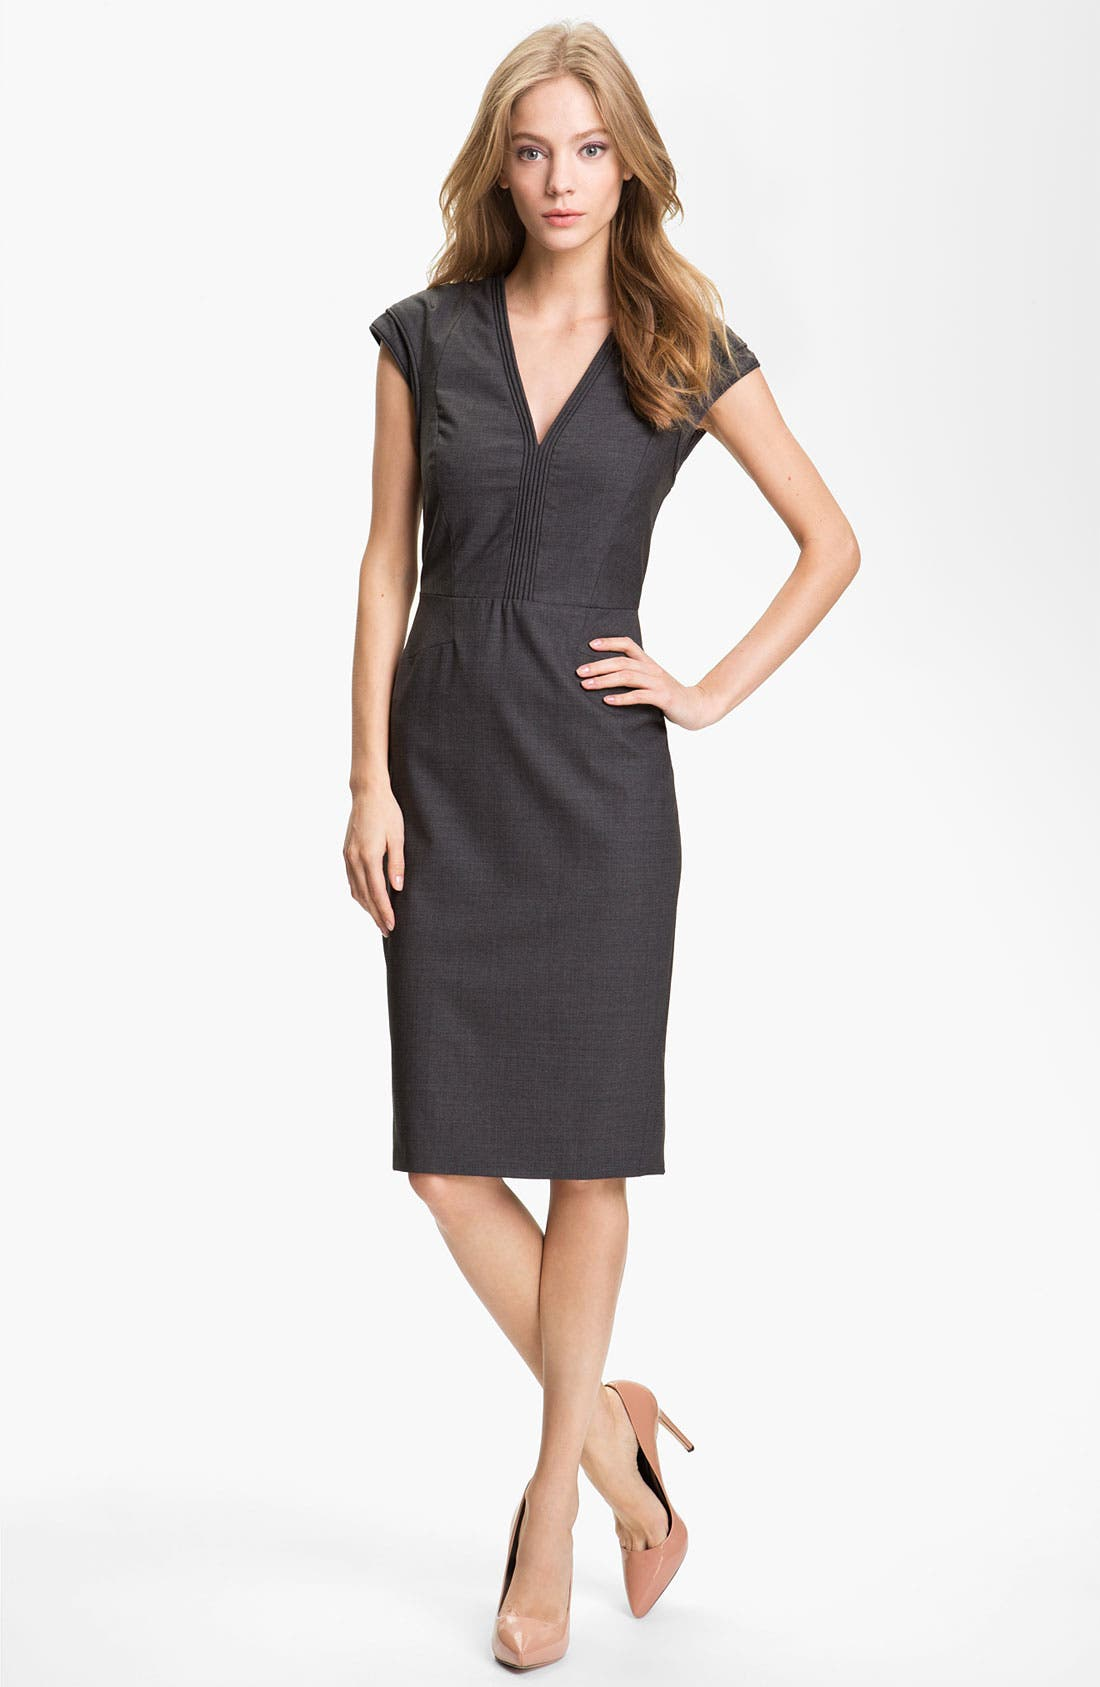 Alternate Image 1 Selected - Rachel Roy 'Cord' Tropical Wool Sheath Dress